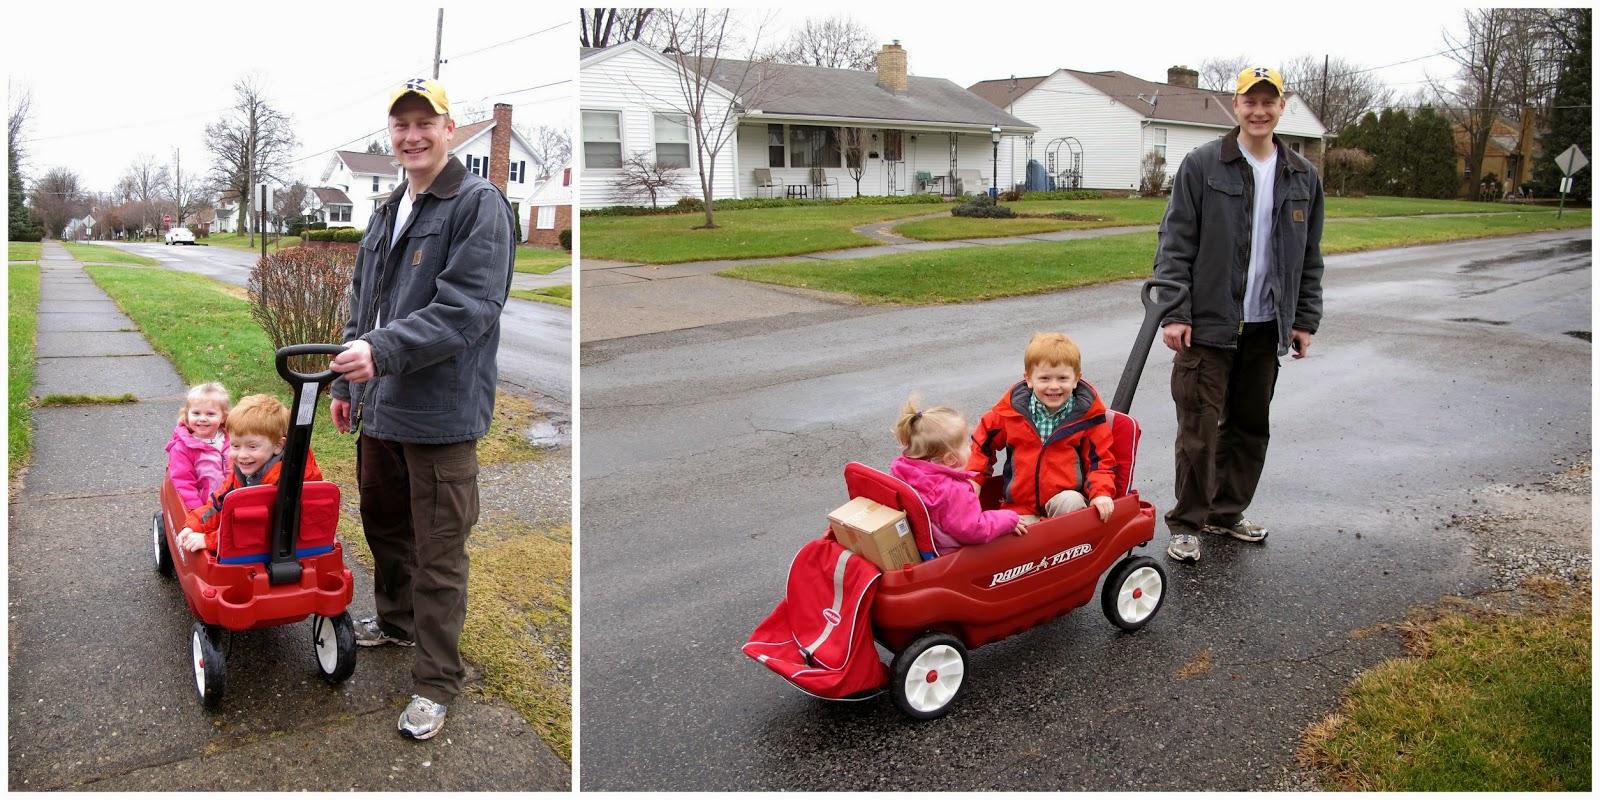 Wagon Ride through the Neighborhood